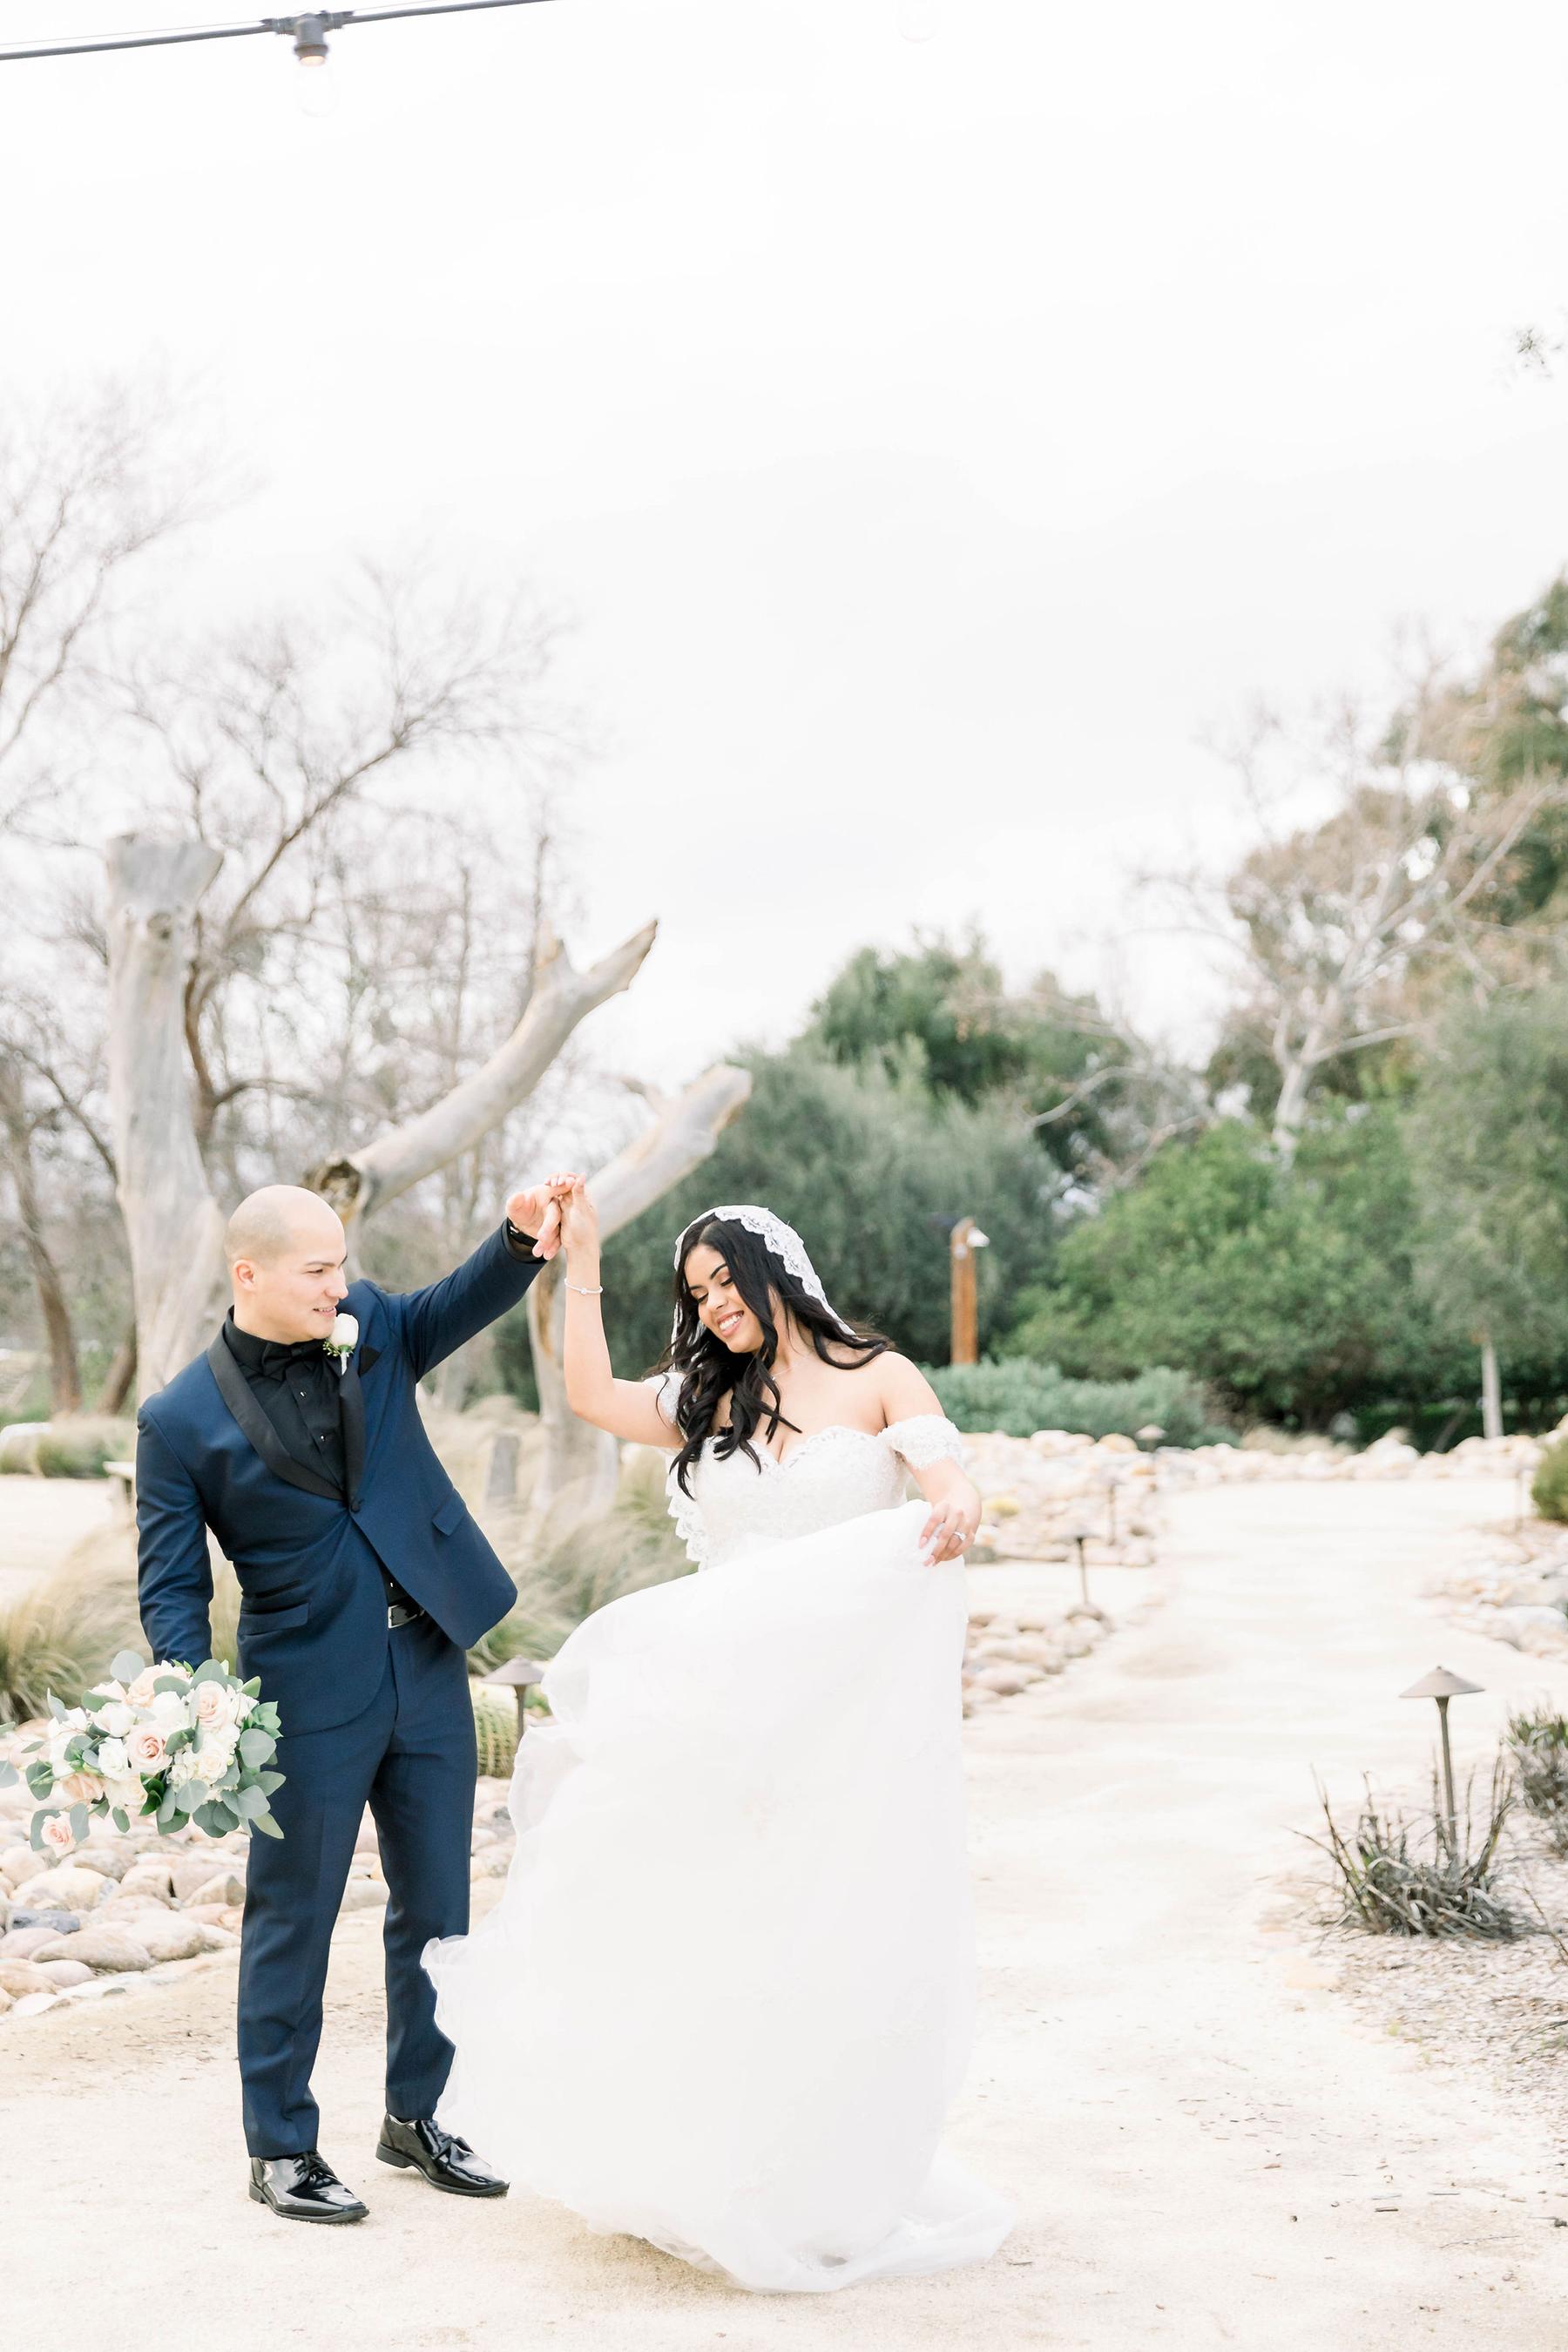 Blush Colored Wedding in the Temecula Desert Janita Mestre30